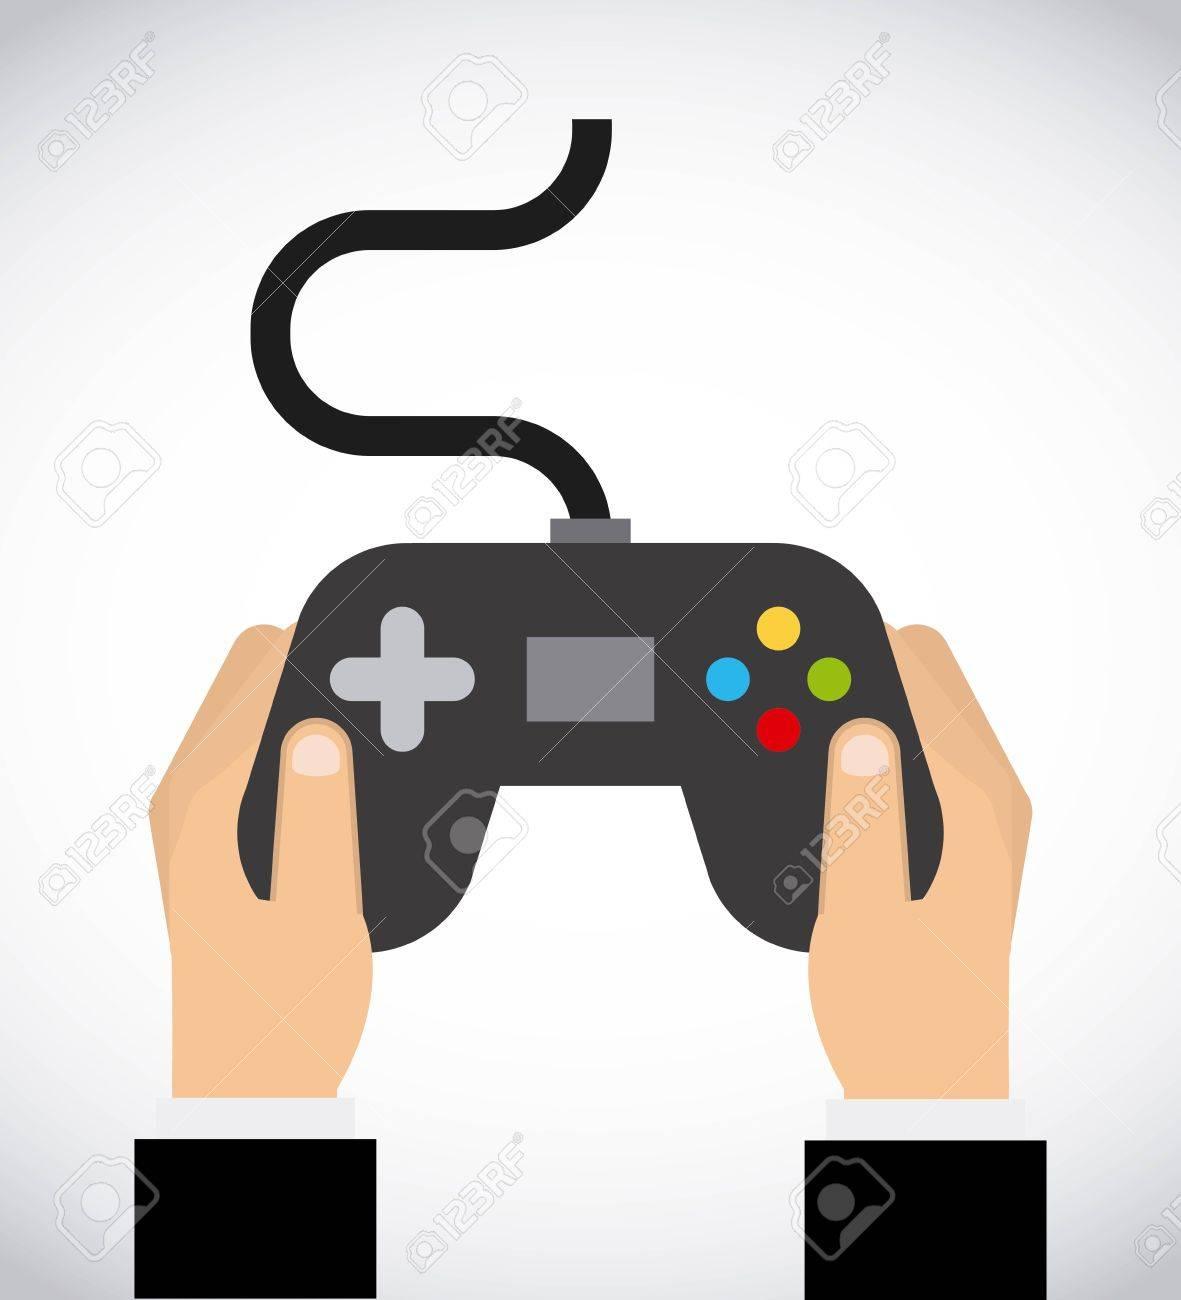 Video game design over white background, vector illustration.